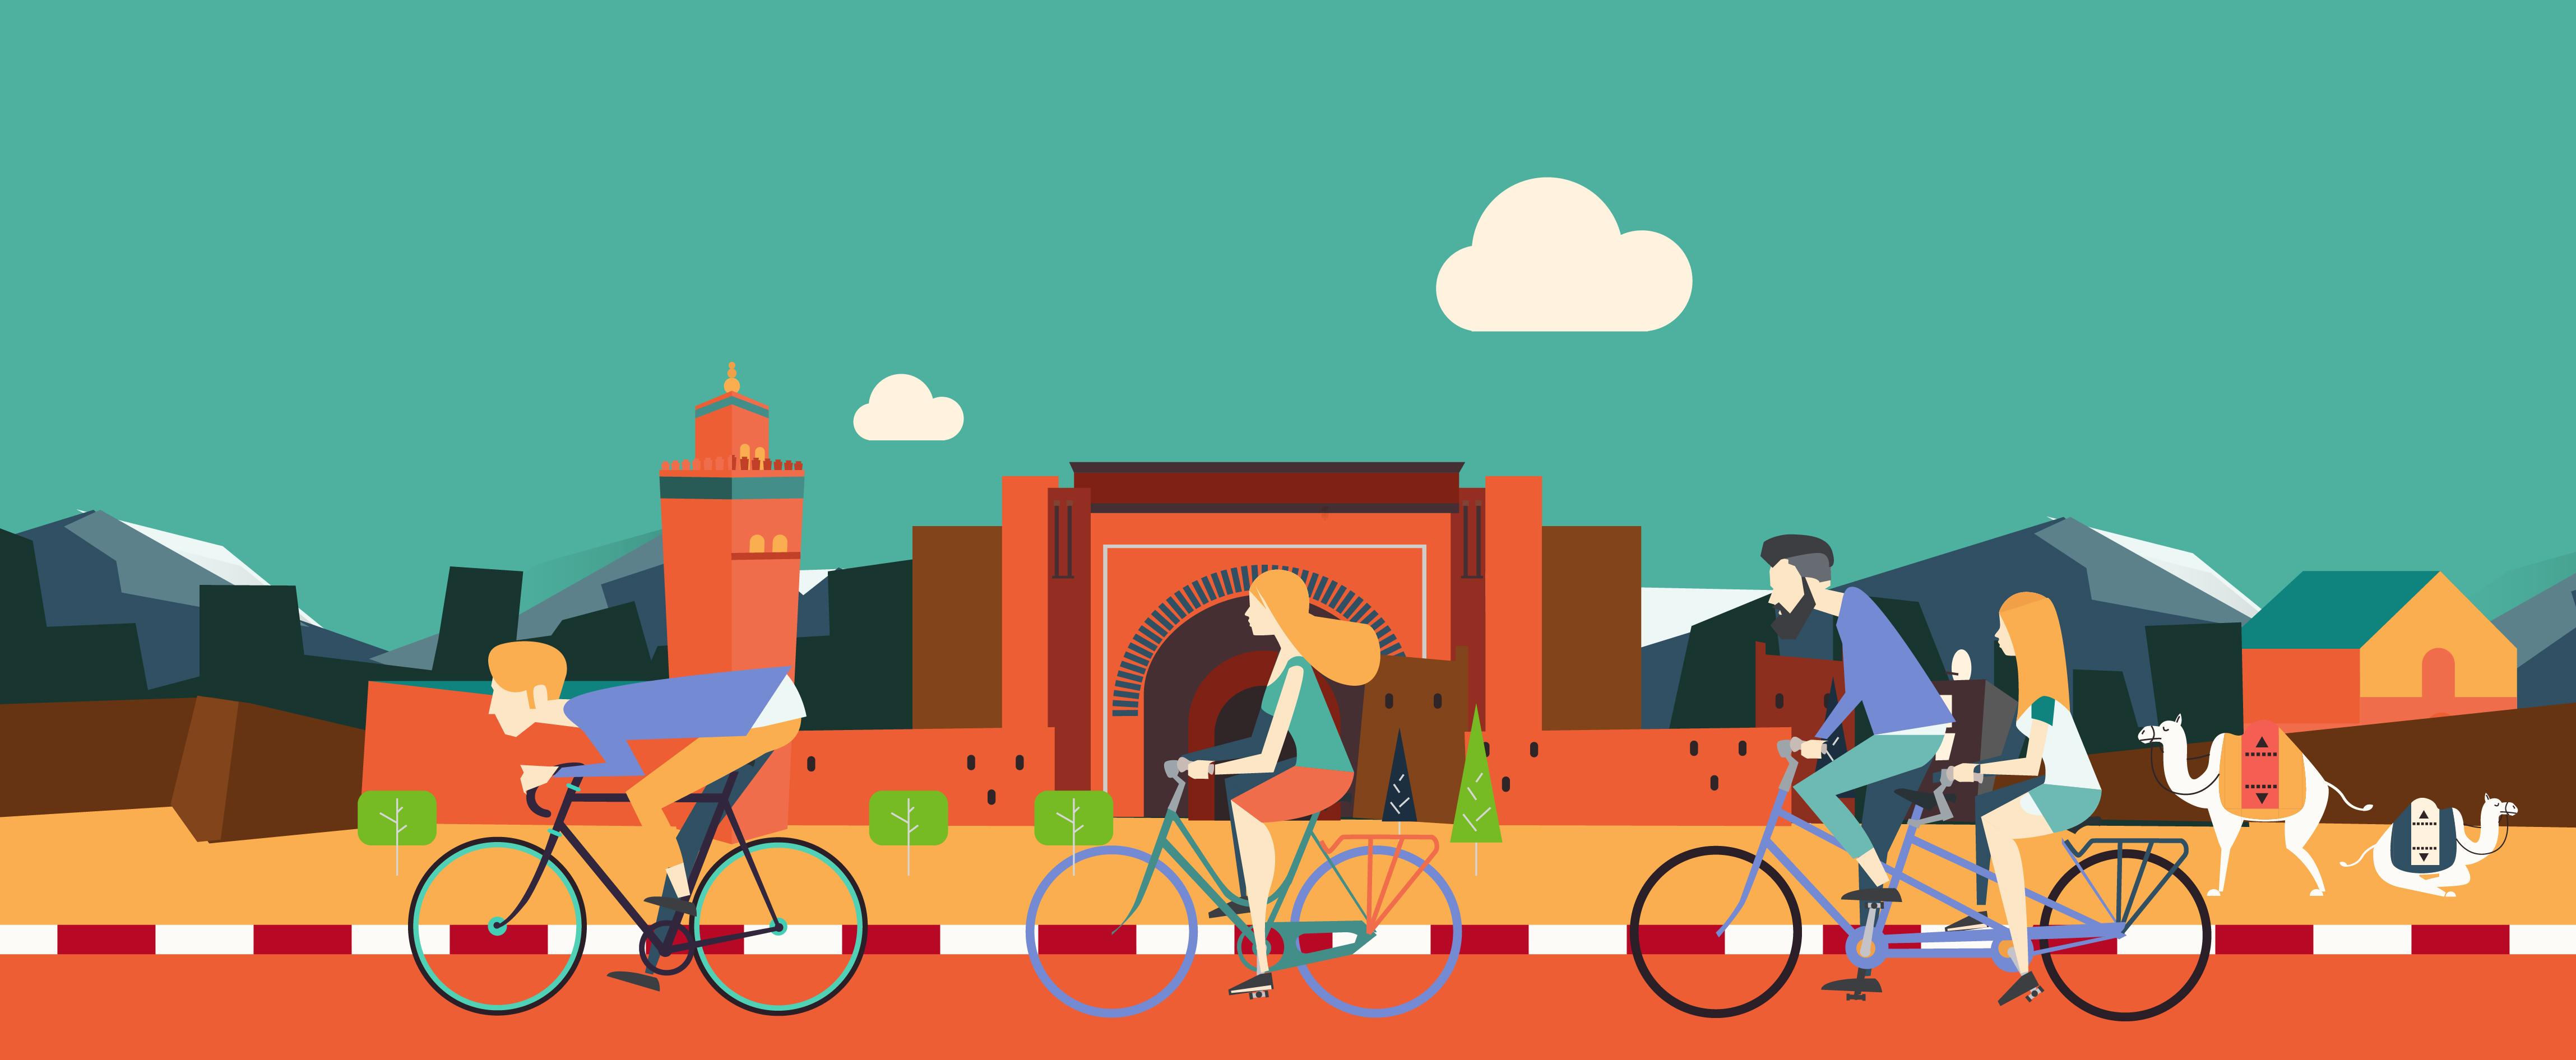 Marrakech Green Wheels - City Bike Tours in Marrakech 07514b603